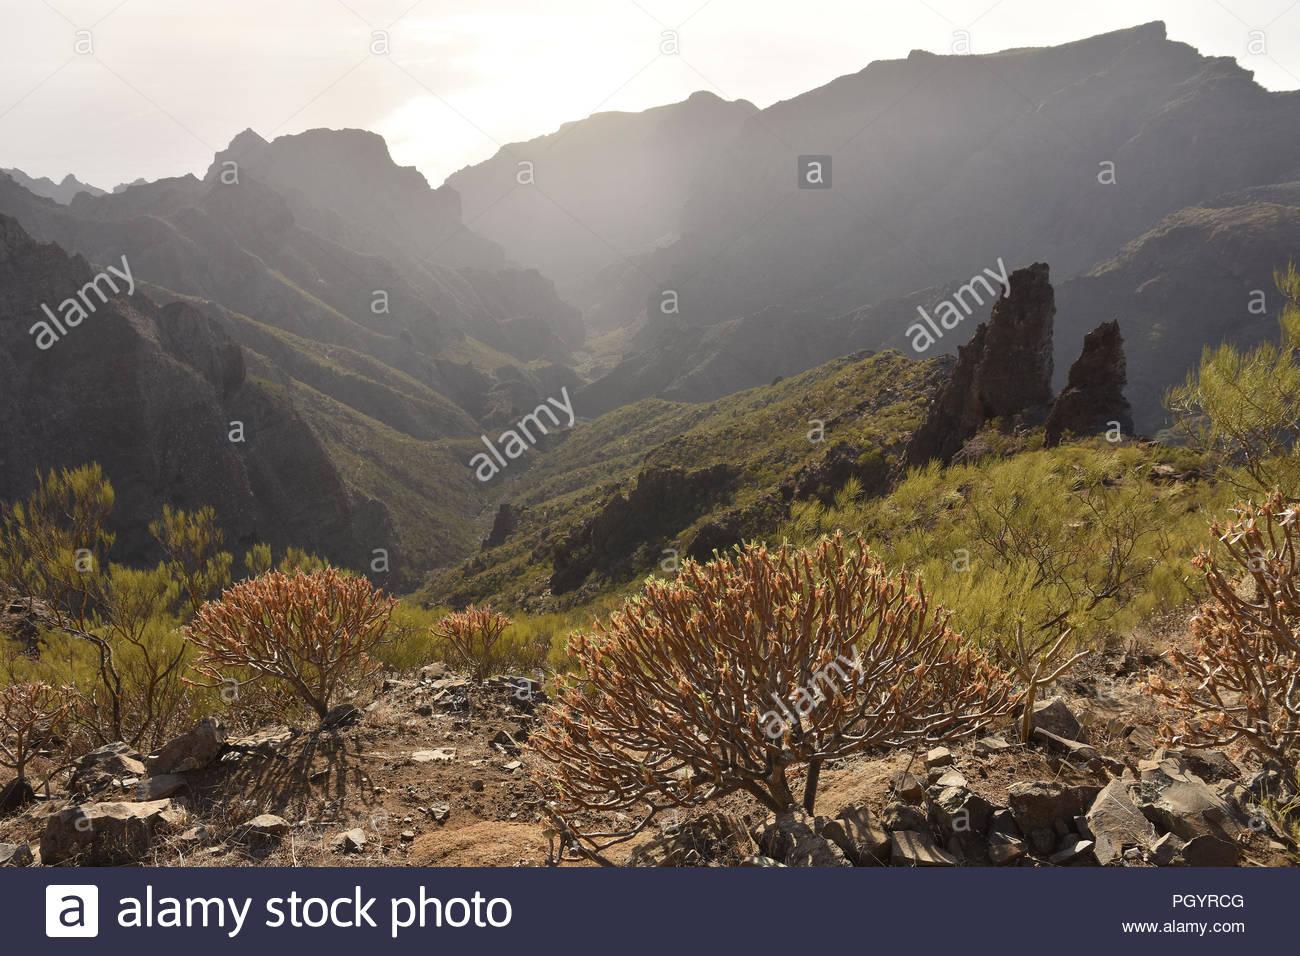 Den Berg Macizo de Teno-ariden Vulkanlandschaft mit sukkulenten Pflanzen, Teno-gebirge im Nordwesten von Teneriffa Kanarische Inseln Spanien. Stockbild